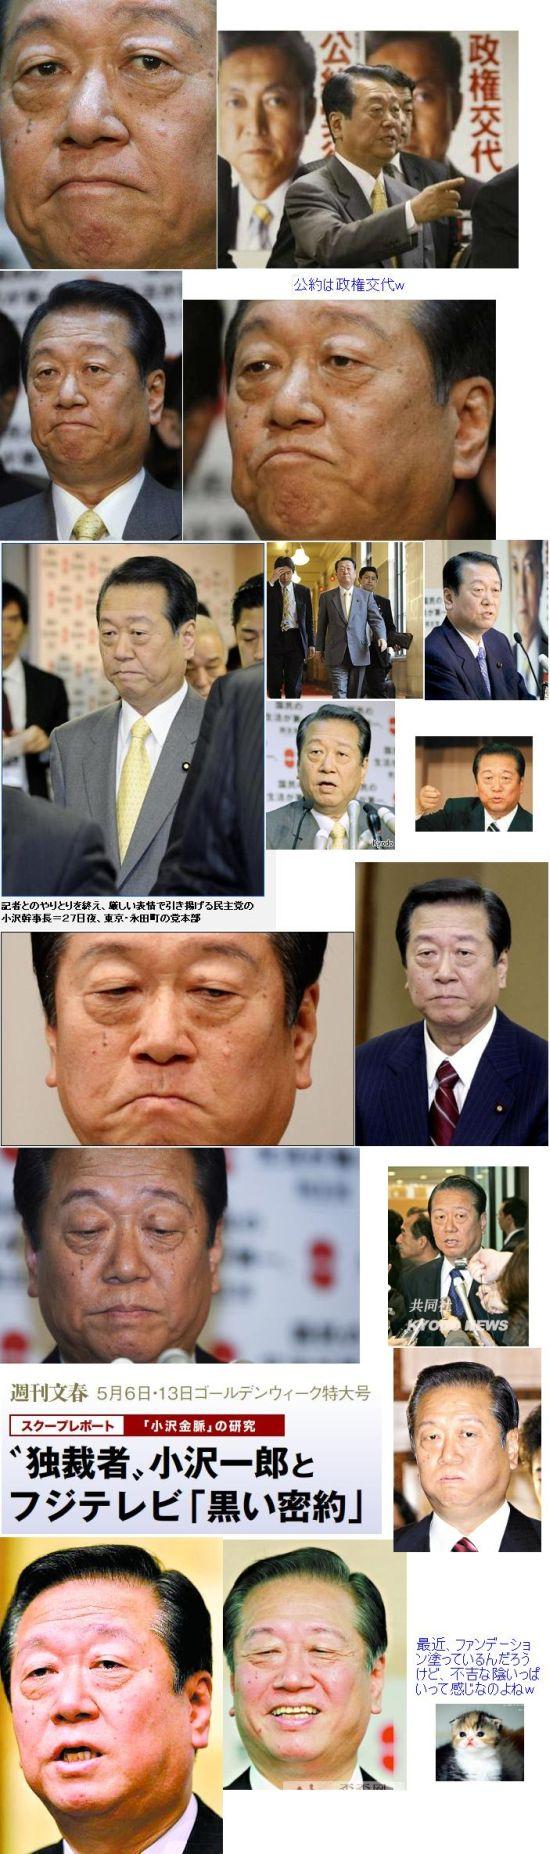 ozawa201004endwww2.jpg